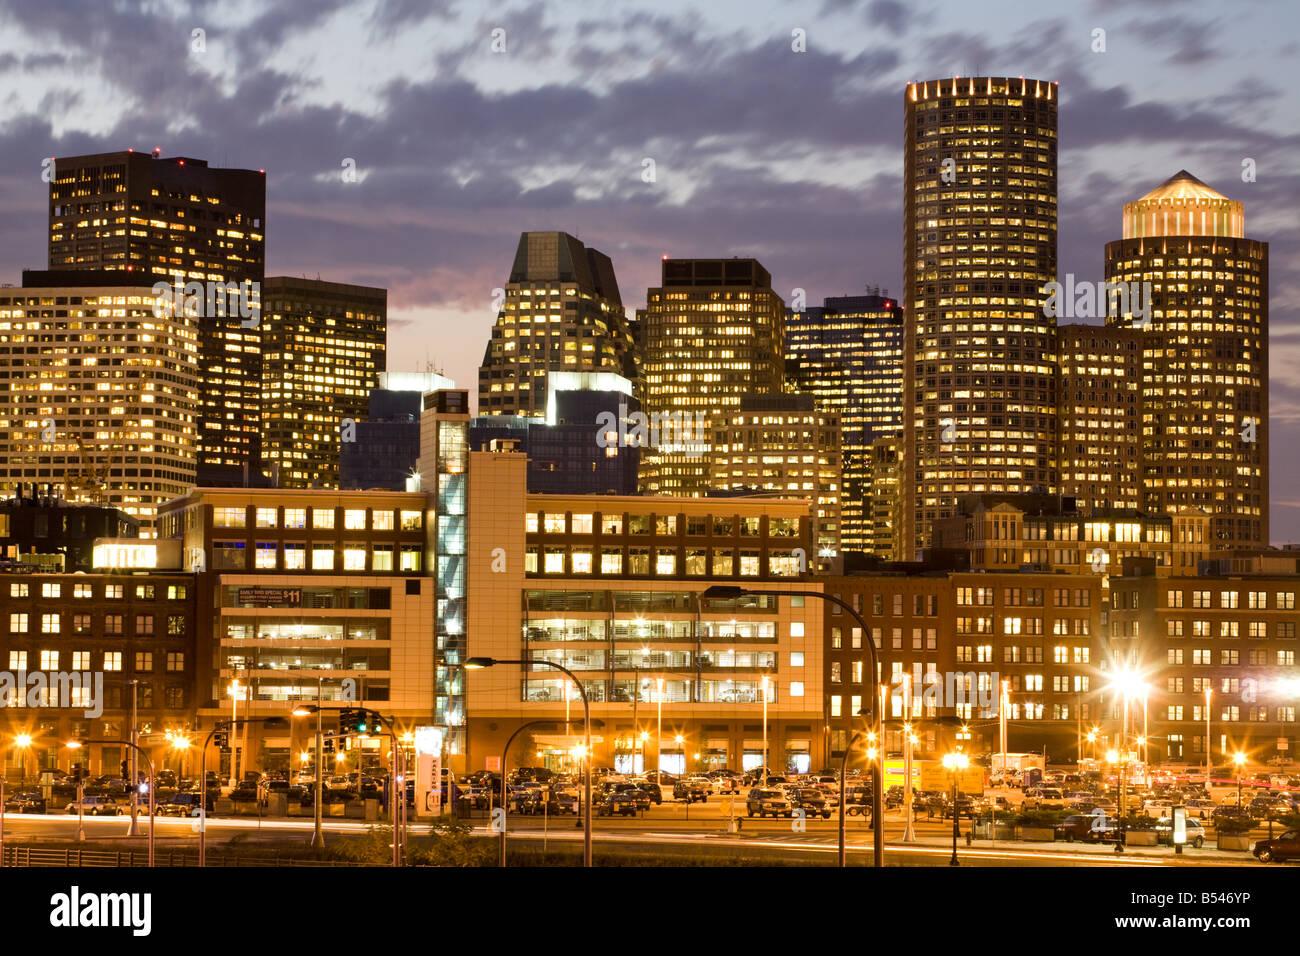 Crepuscolo skyline financial district Boston Massachusetts Immagini Stock